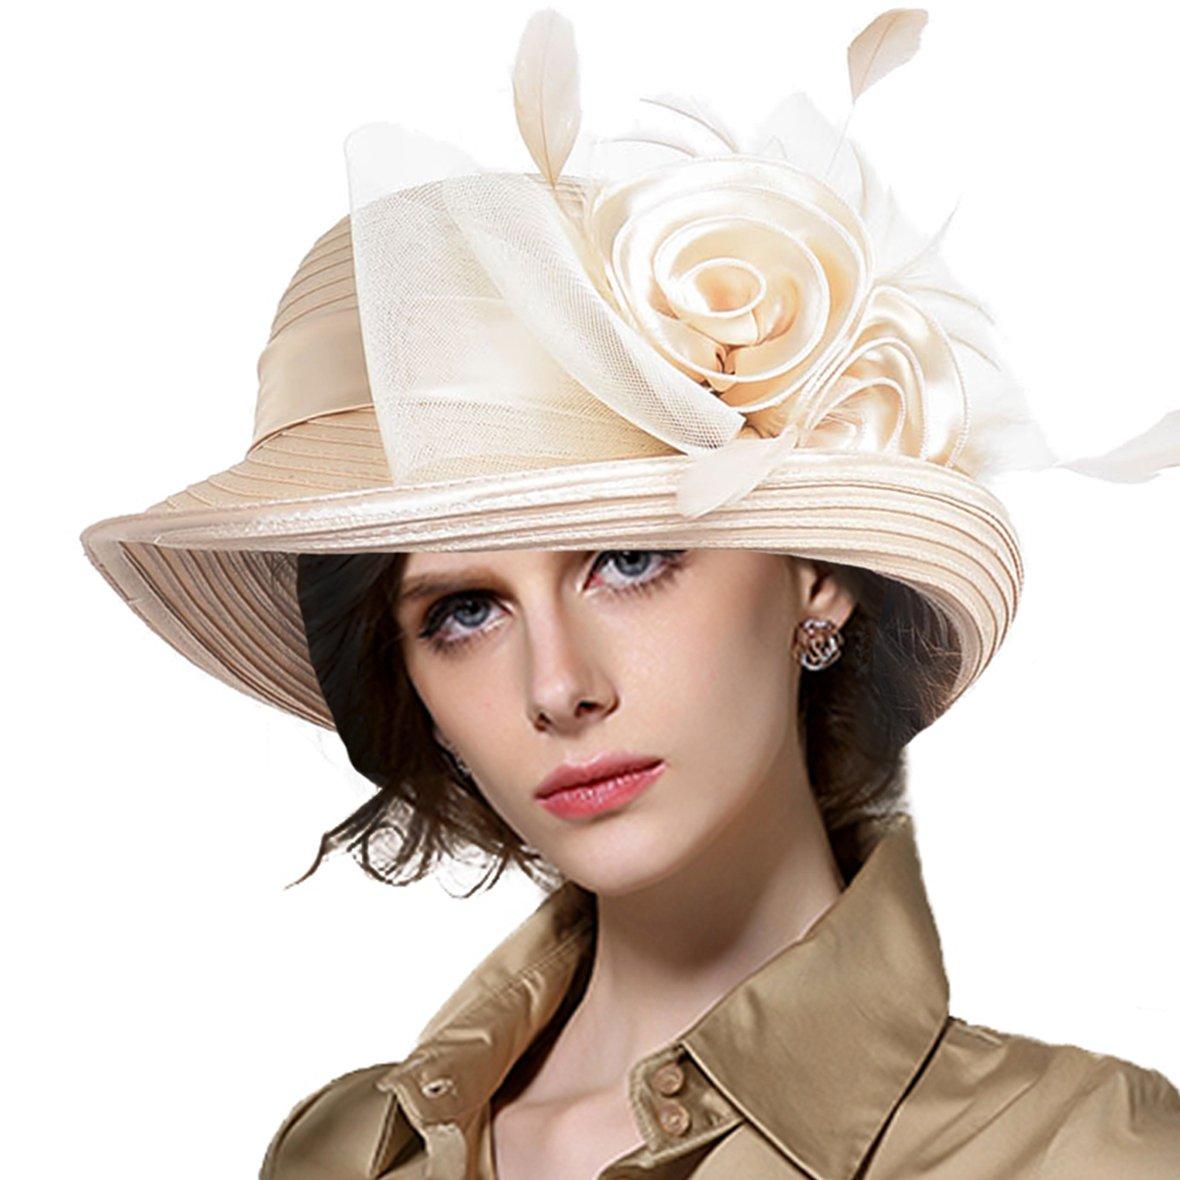 VECRY Lady Derby Dress Church Cloche Hat Bow Bucket Wedding Bowler Hats (Bowler-Apricot),Medium